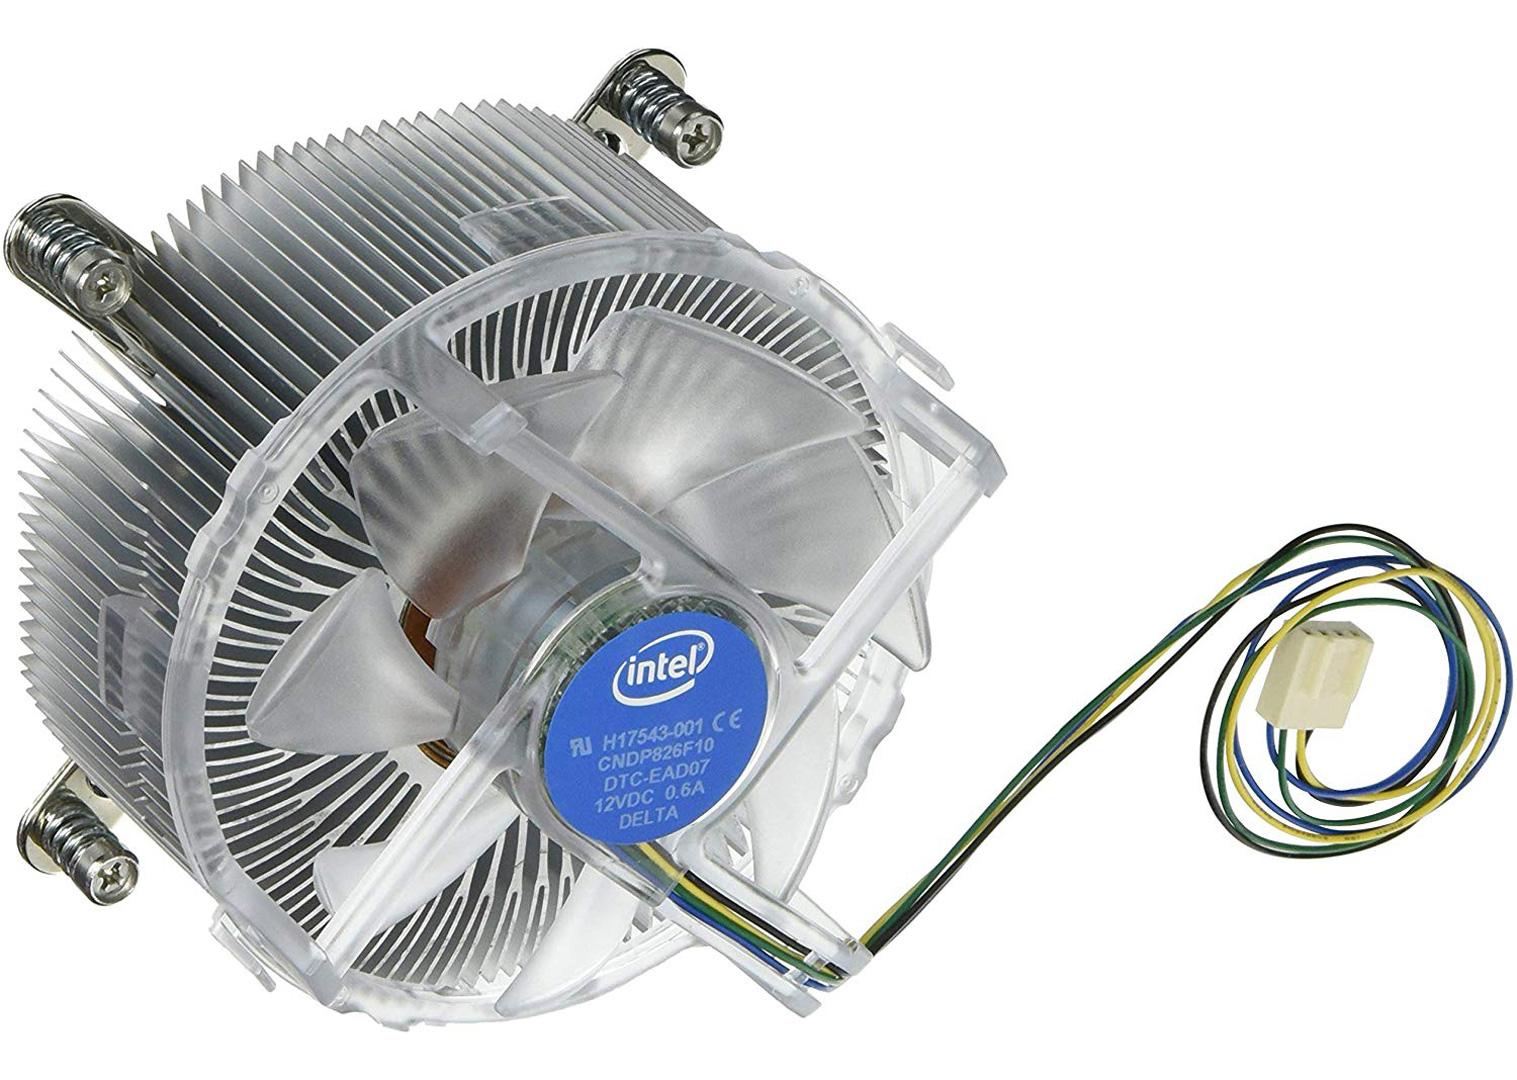 Intel BXTS13A Thermal Solution For LGA2011 Sockets